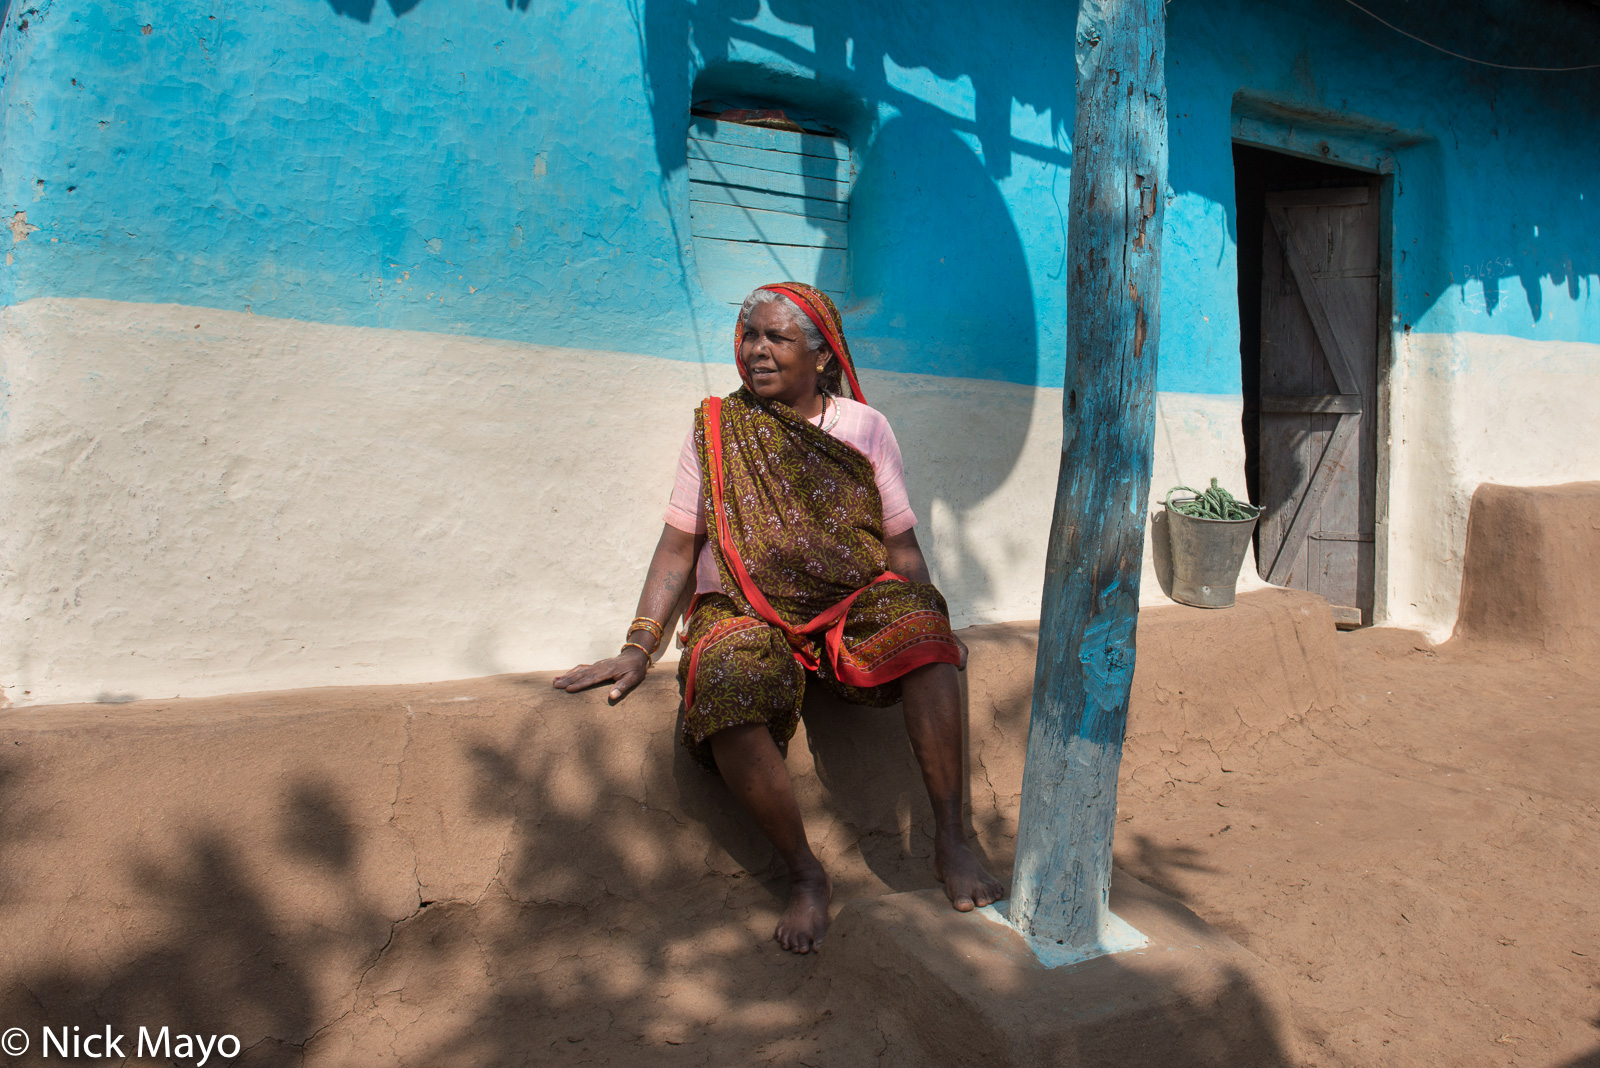 Chhattisgarh, India